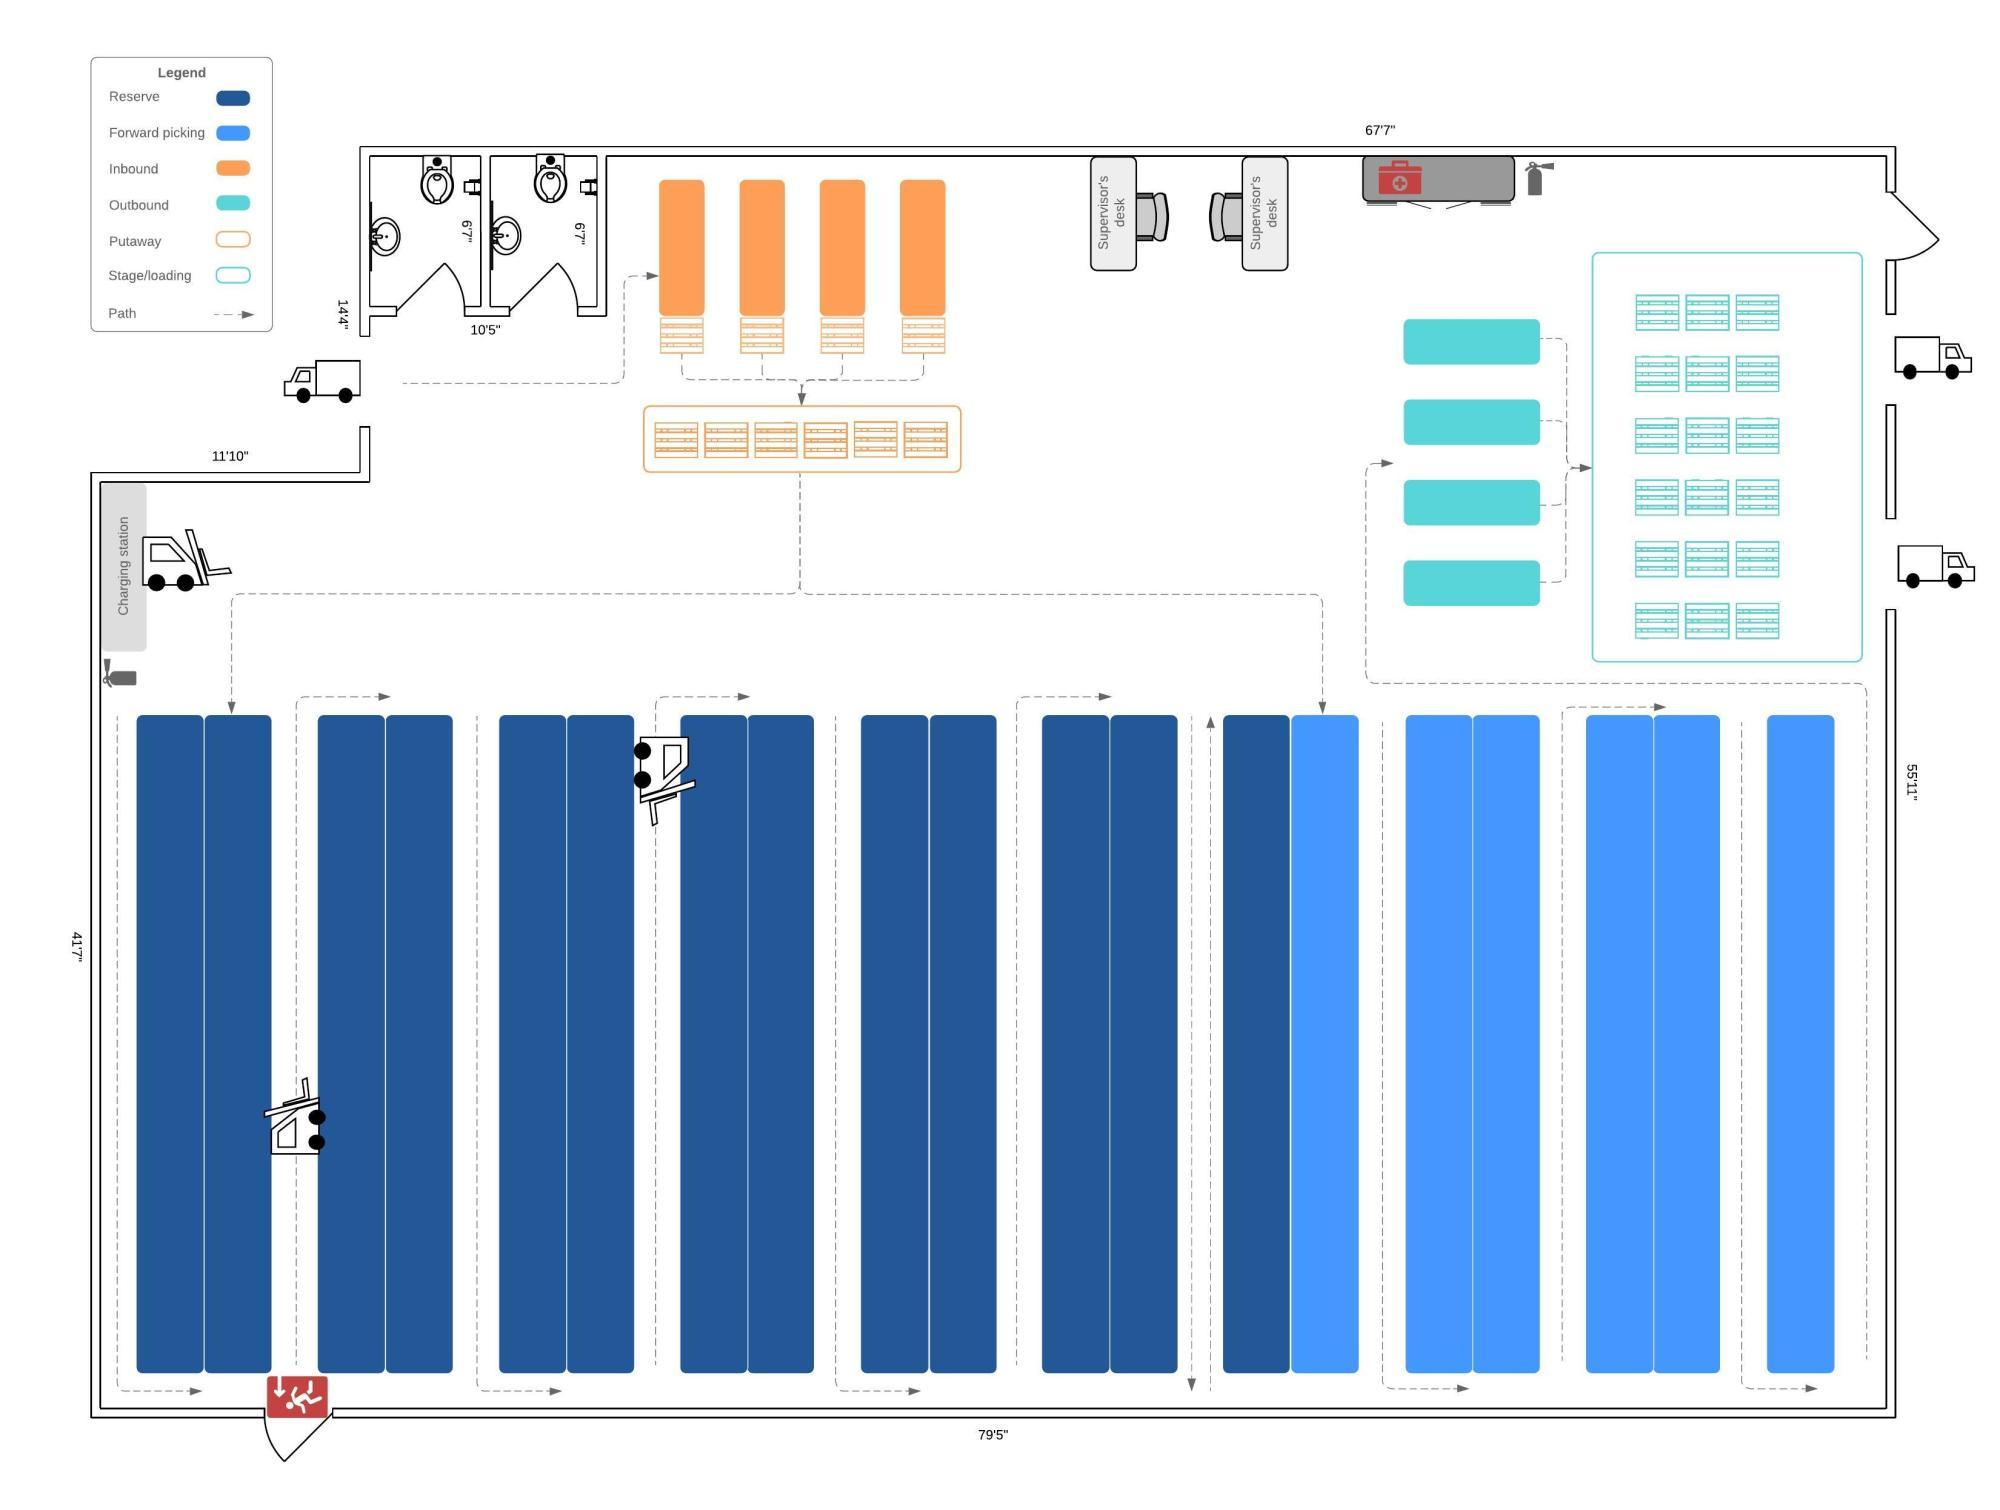 hight resolution of warehouse floorplan example